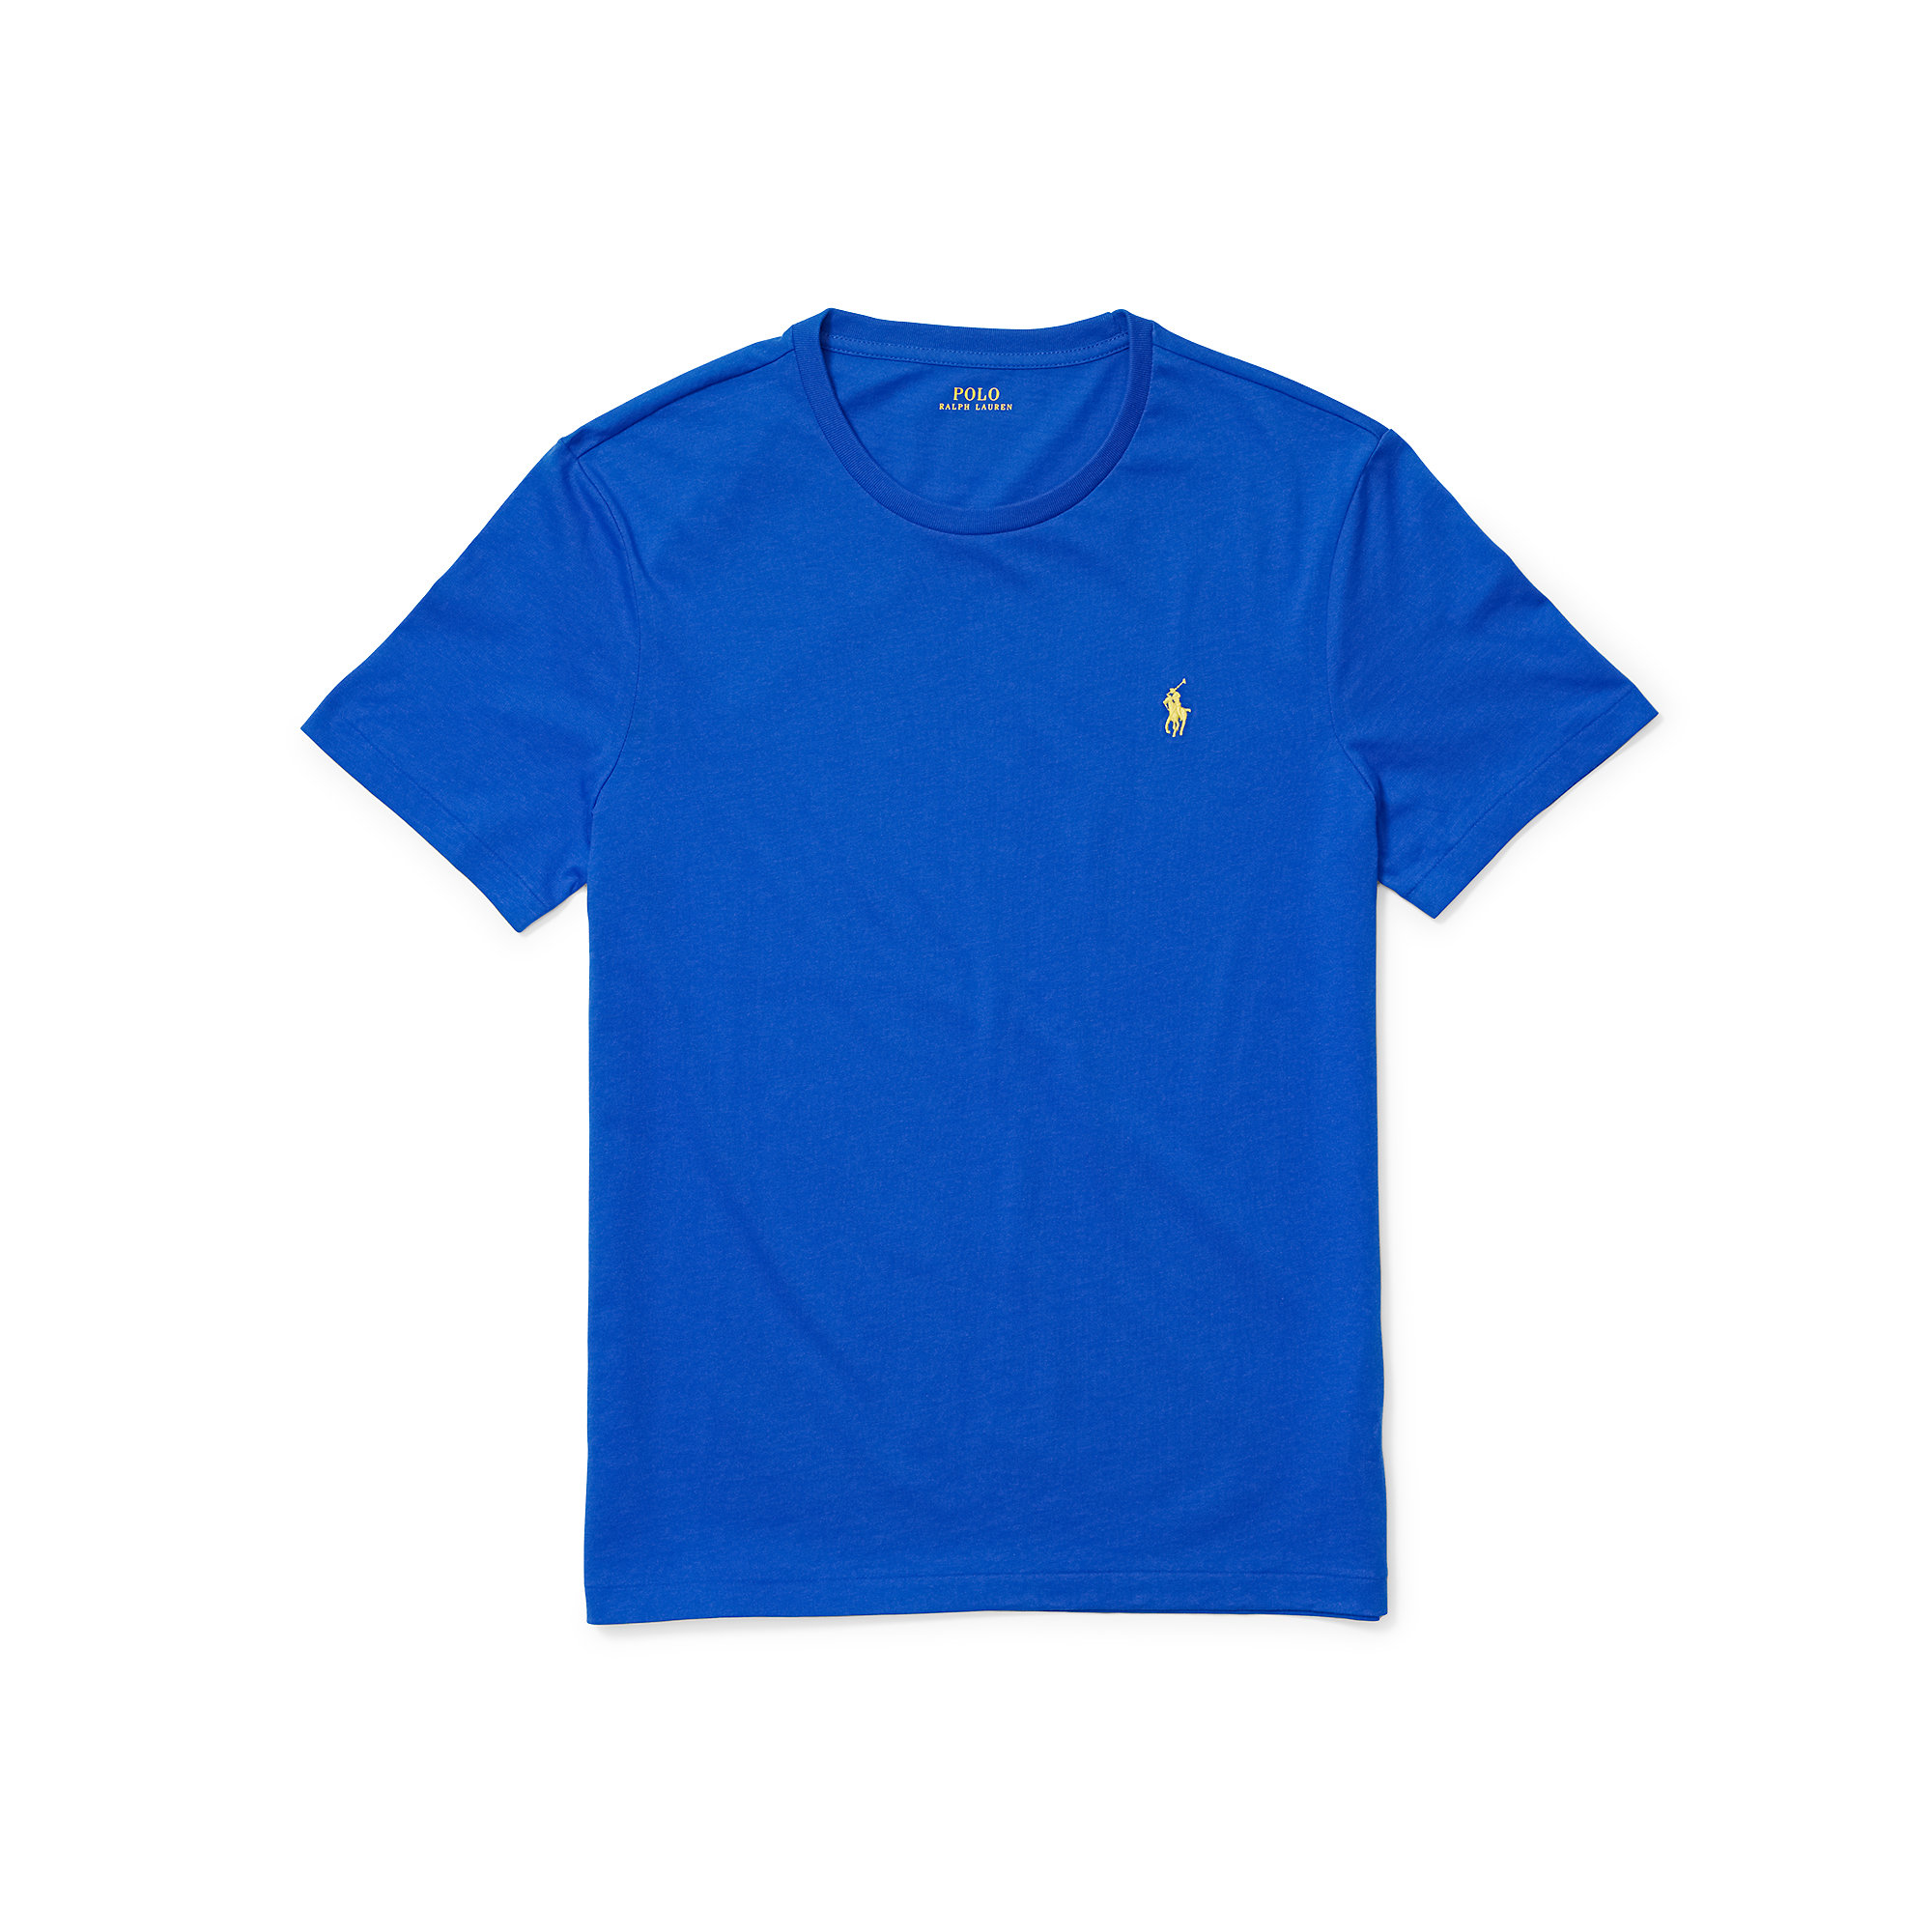 Polo ralph lauren custom fit cotton t shirt in blue for for Polo custom fit t shirts